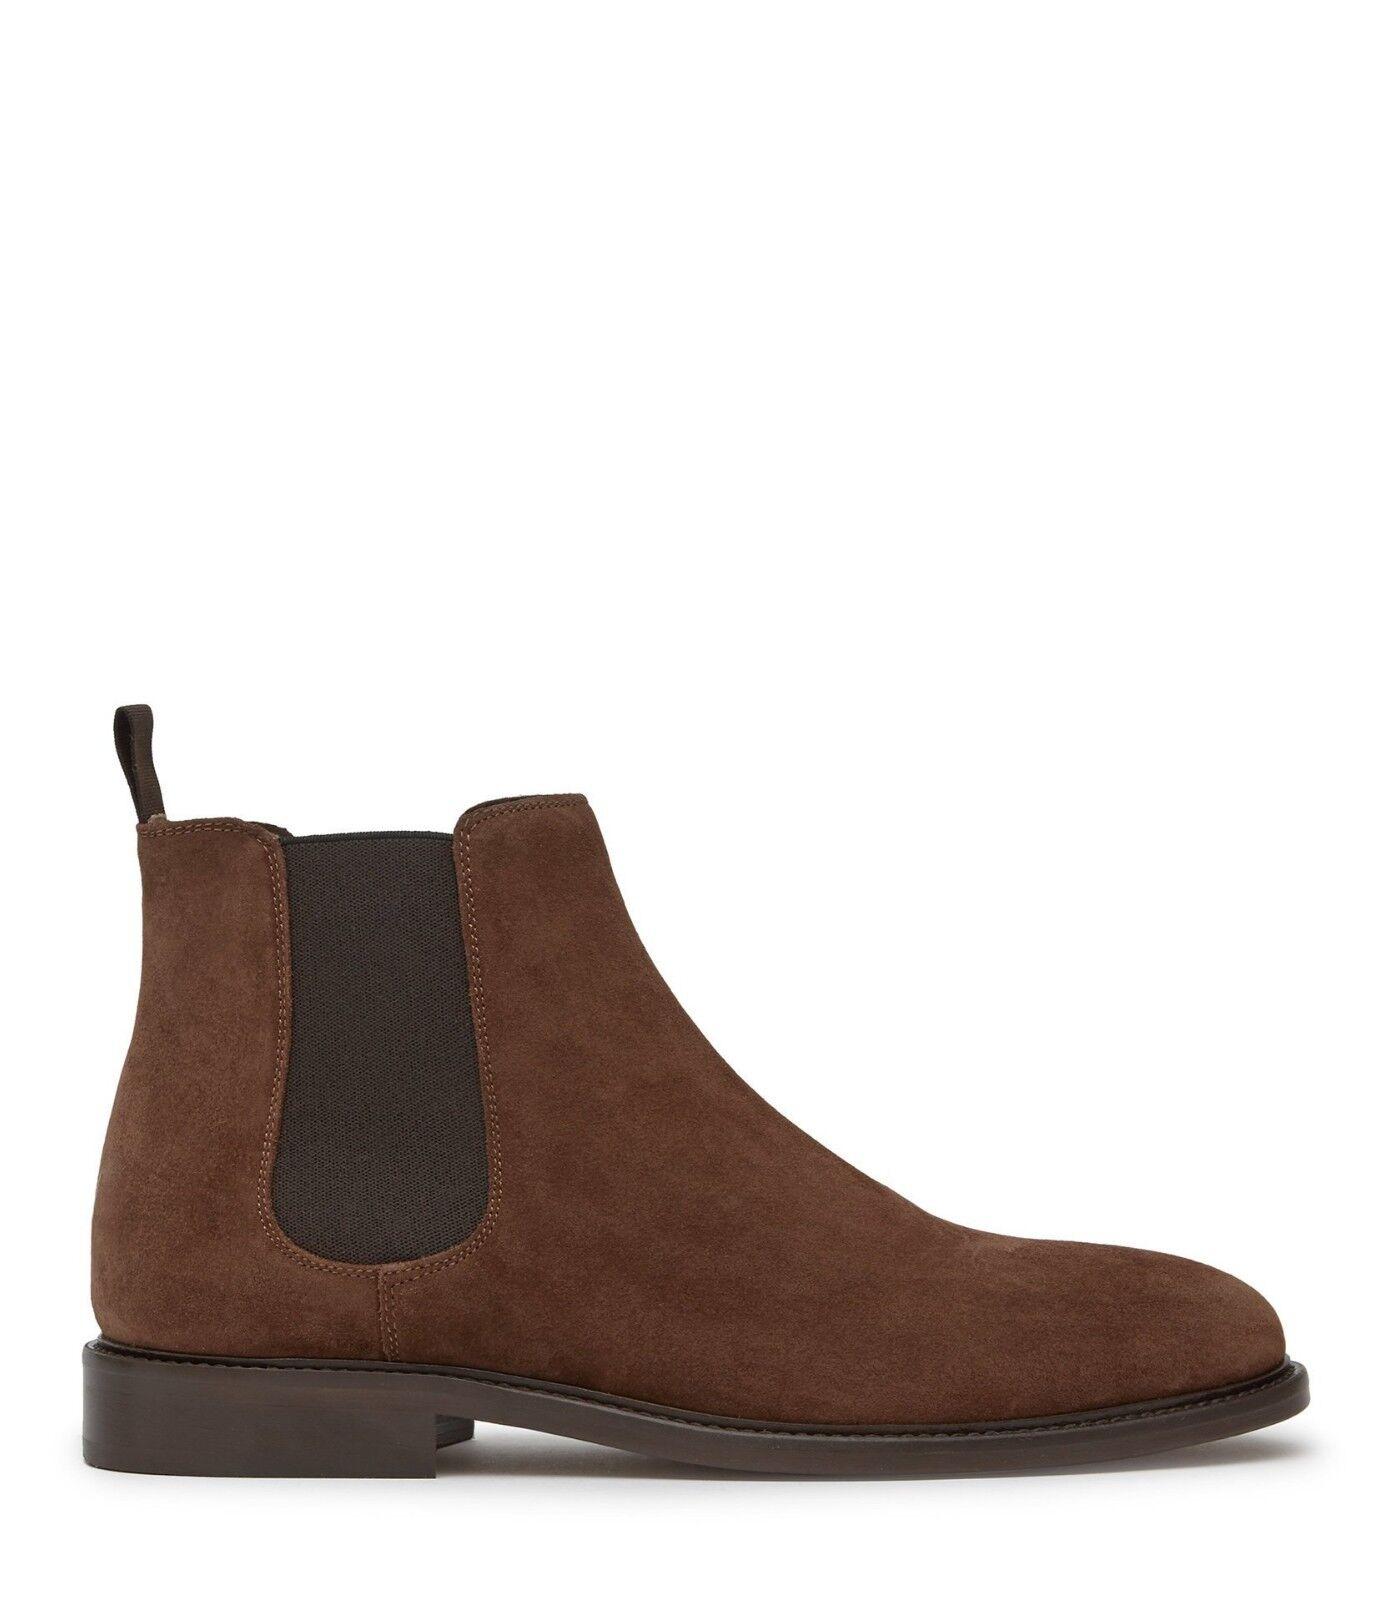 New Men's REISS Mid Brown Suede Chelsea Boots Size UK10 SLP Wyatt Made in